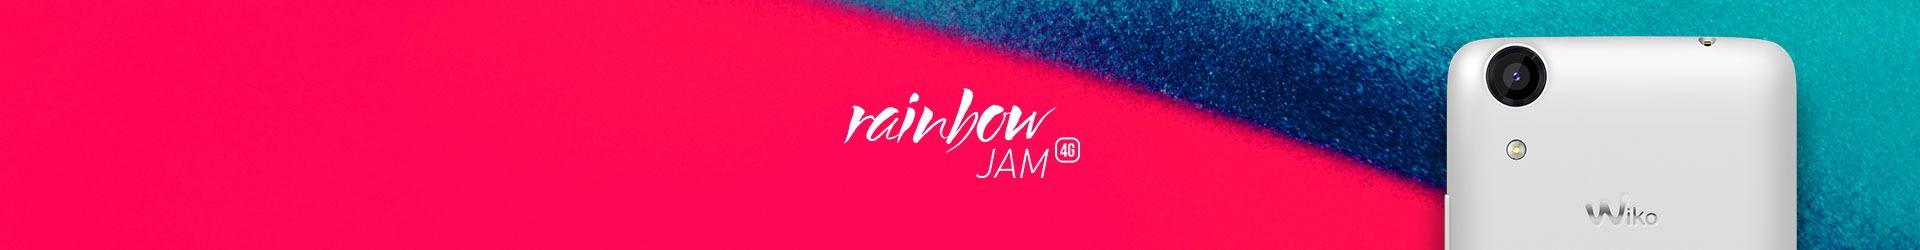 rainbow_jam_4g